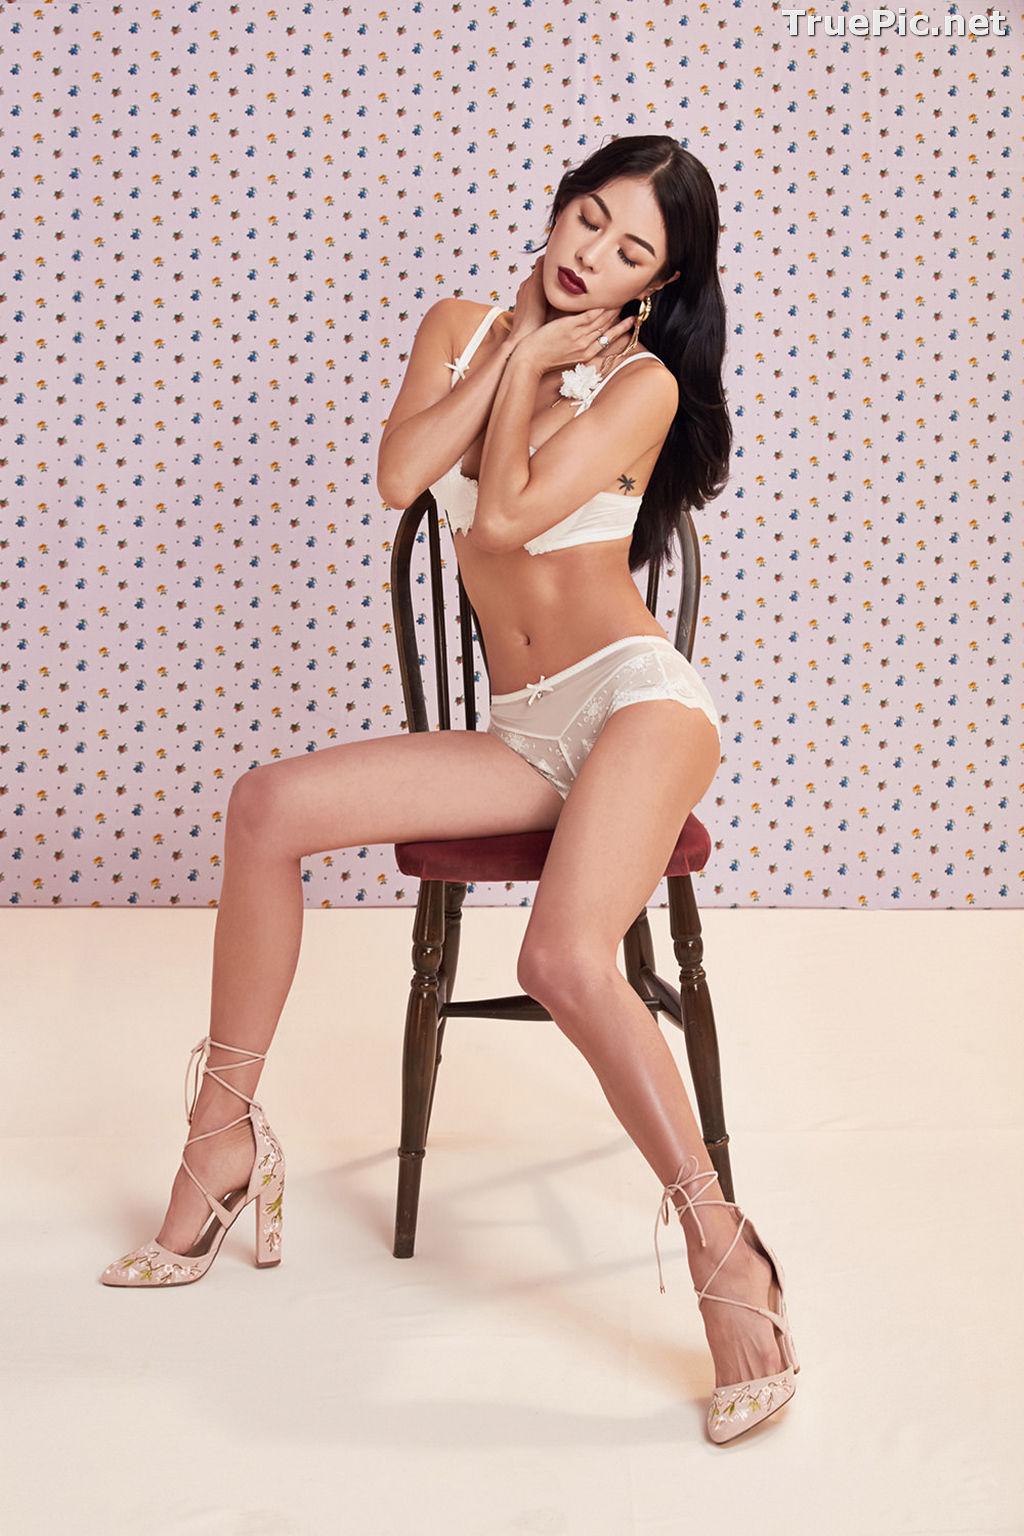 Image Korean Fashion Model - An Seo Rin - White Lingerie and Sleepwear Set - TruePic.net - Picture-5